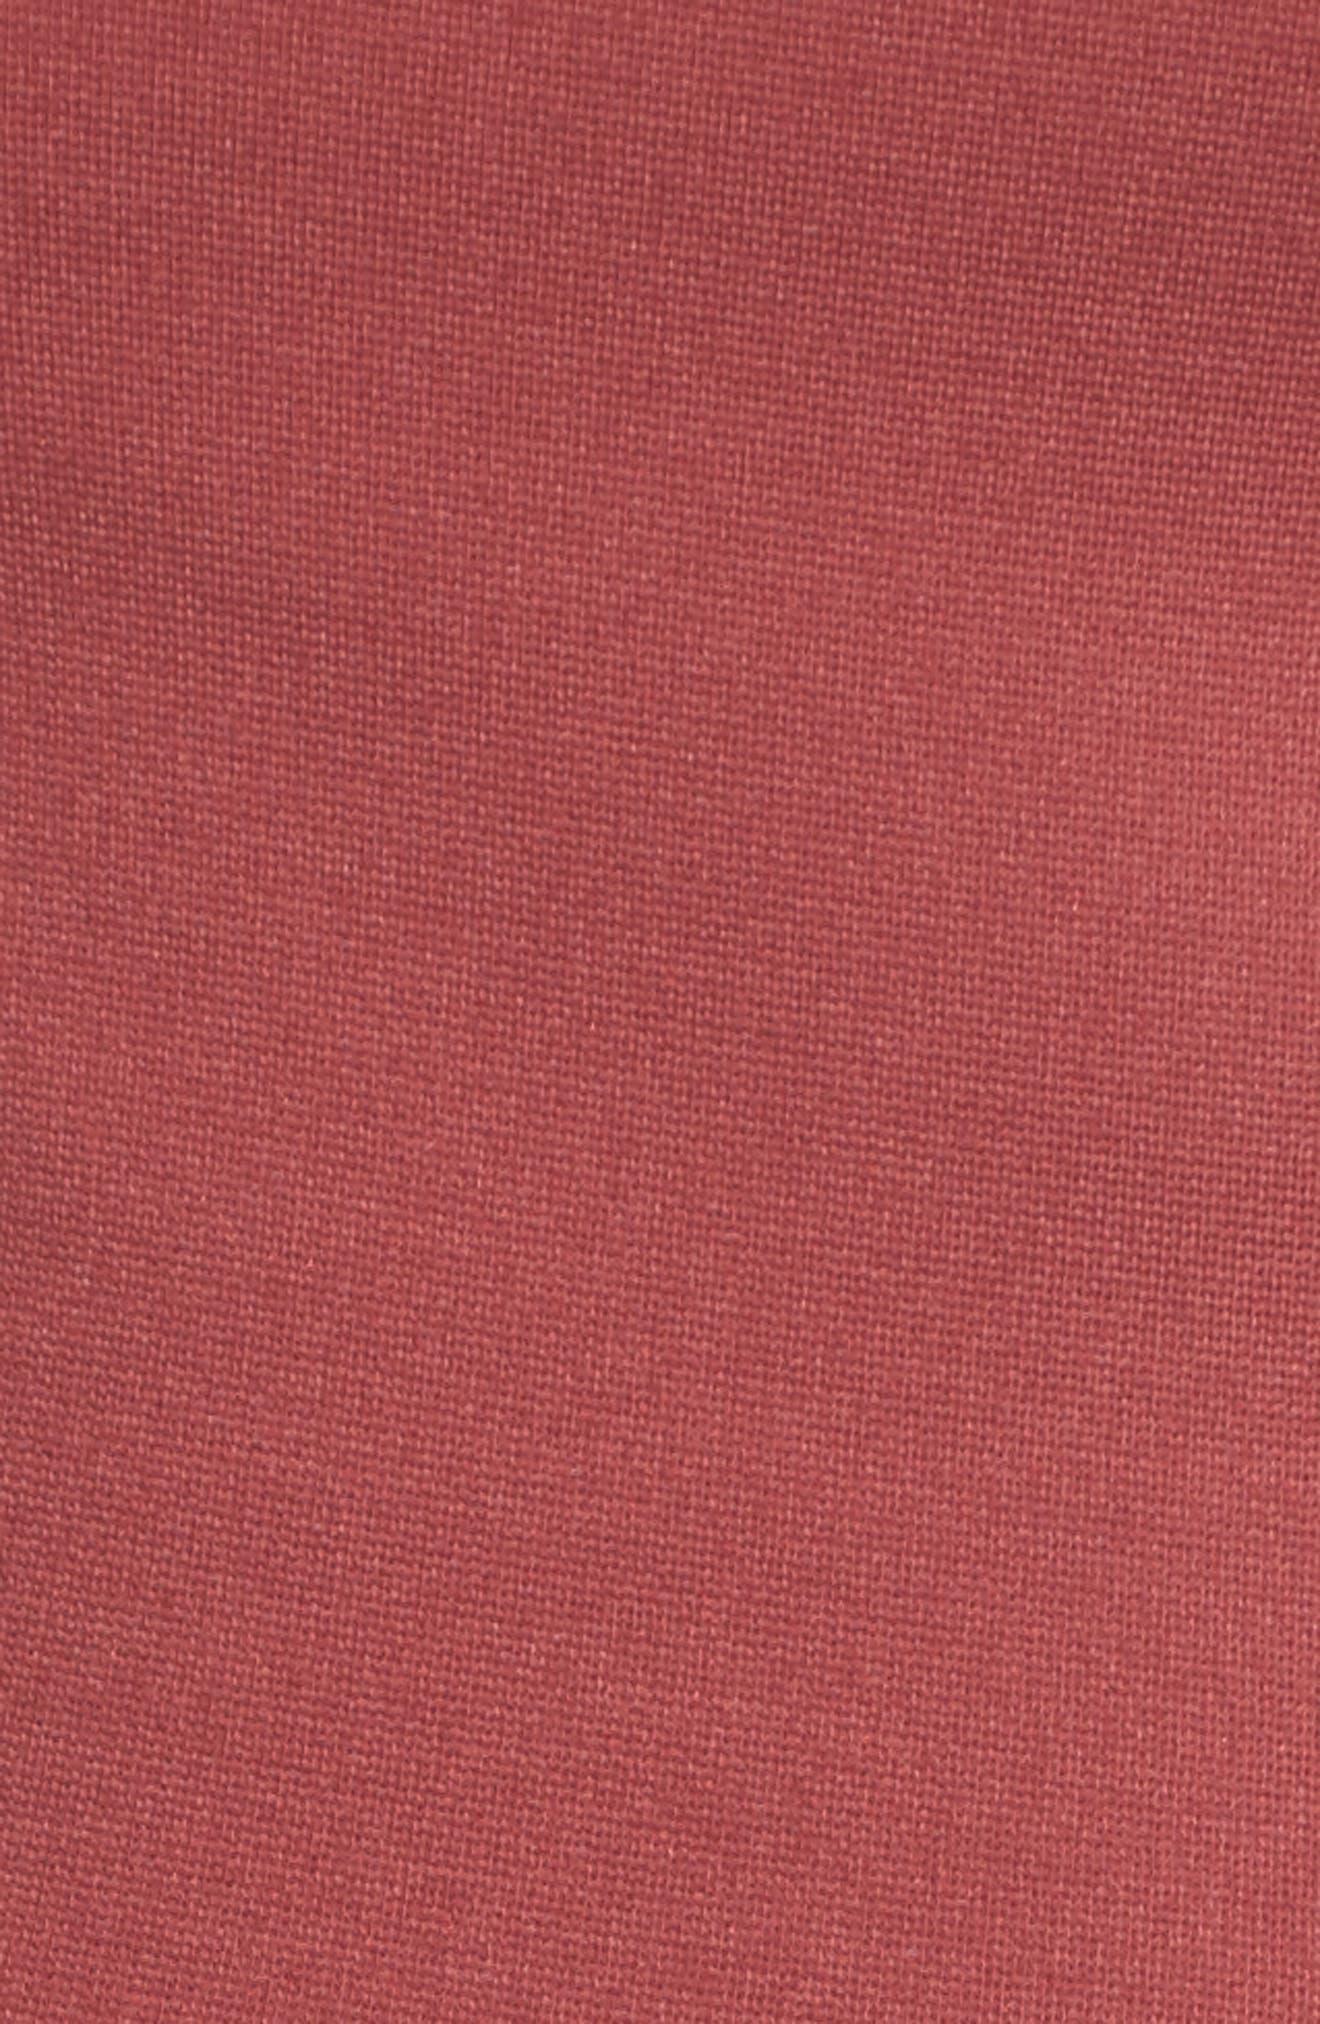 Stretch Knit Midi Dress,                             Alternate thumbnail 52, color,